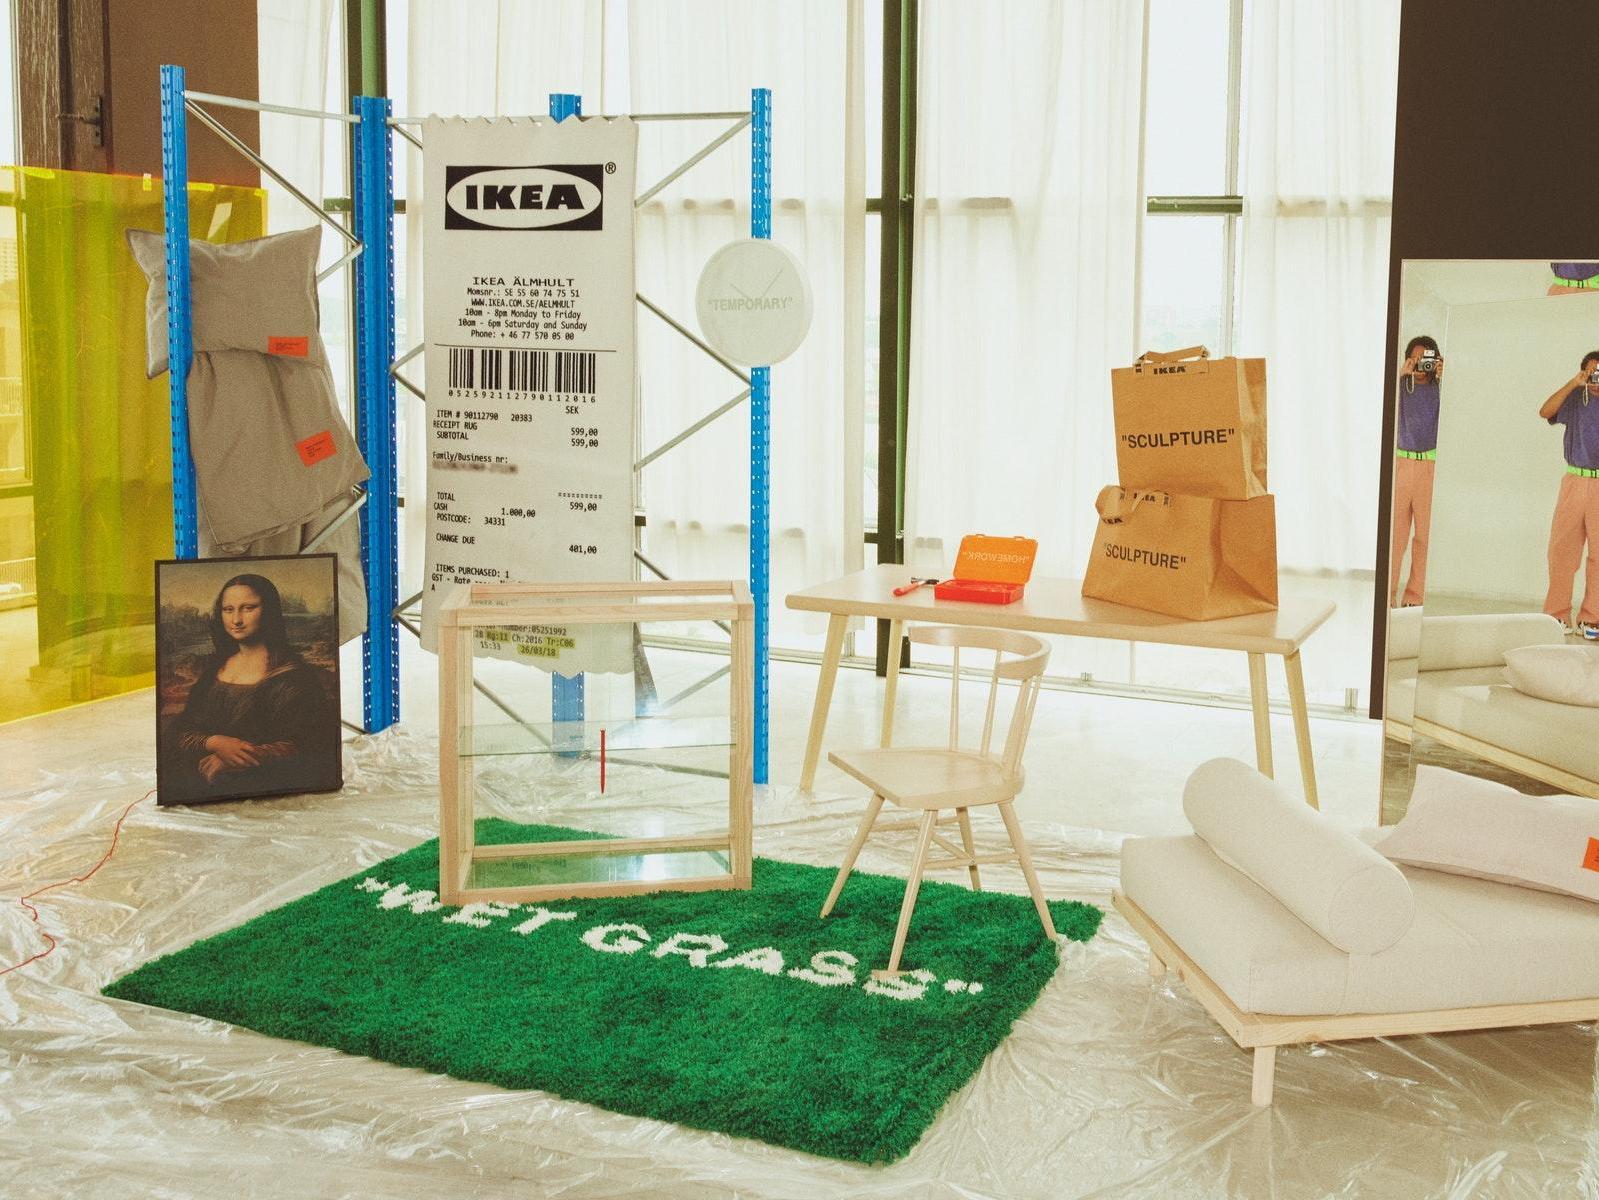 Ikea Teams Up With Louis Vuitton Creative Director Virgil